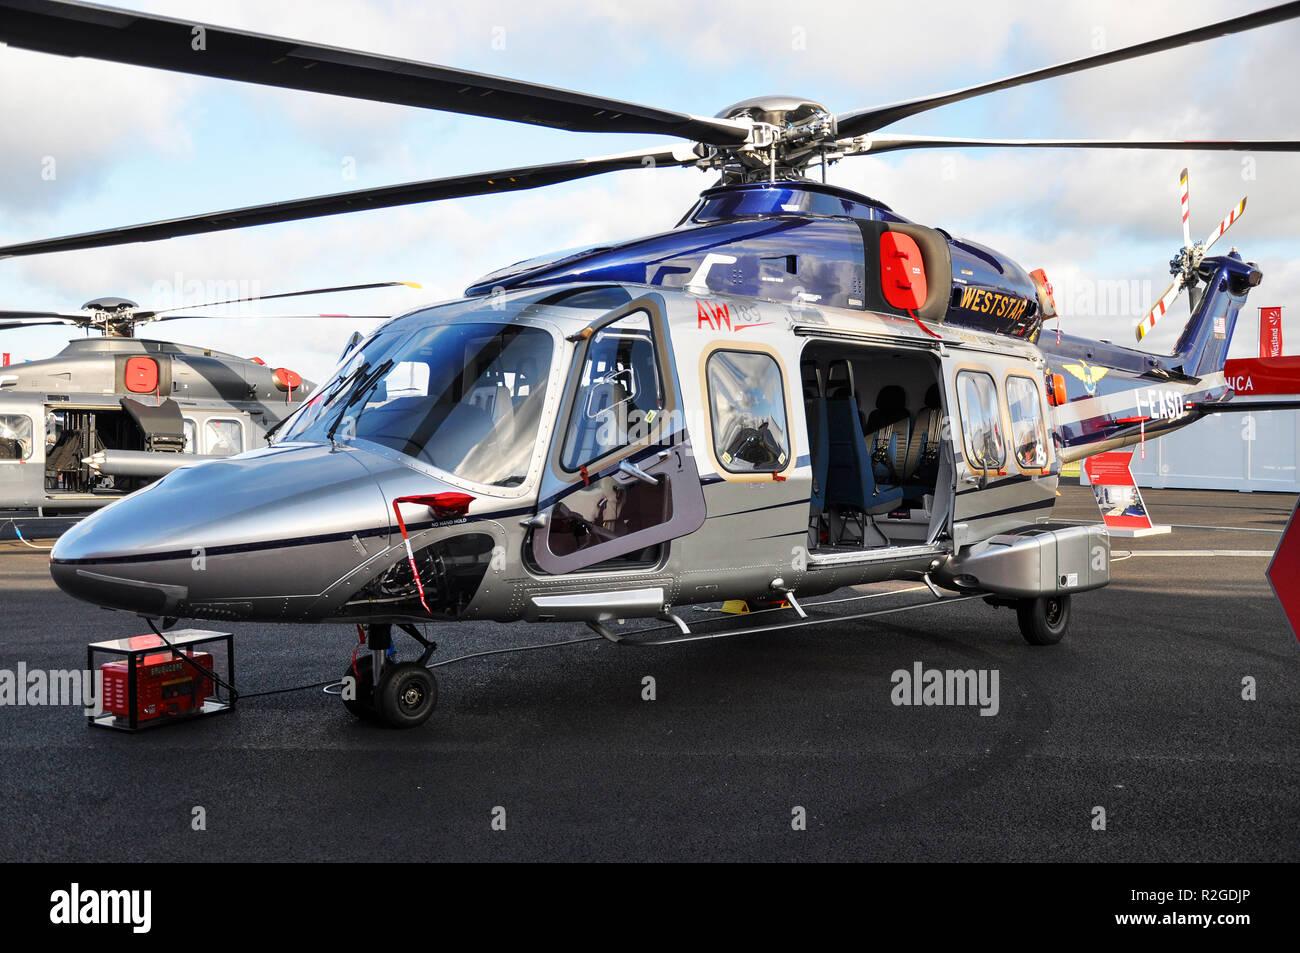 AgustaWestland AW189 twin engined medium lift helicopter manufactured by Leonardo (formerly AgustaWestland, merged into Leonardo Finmeccanica). Launch - Stock Image